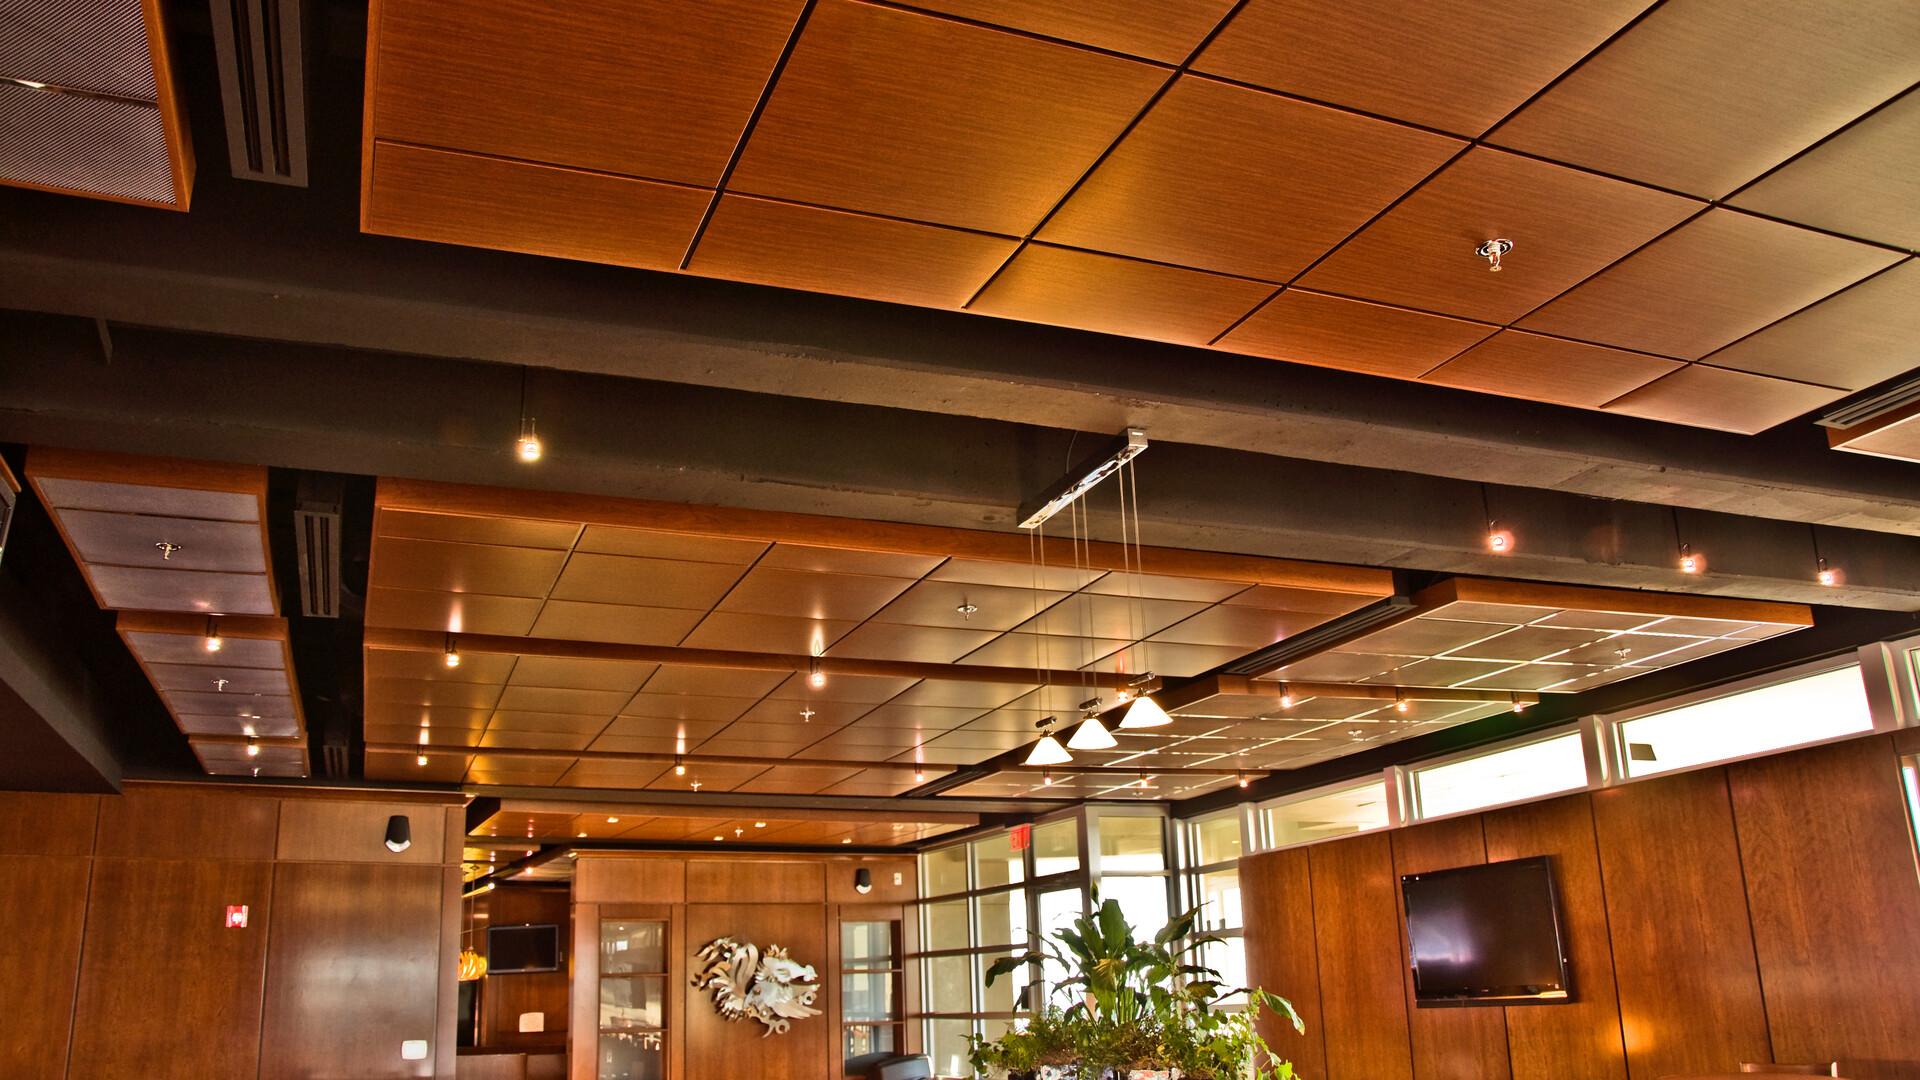 "Featured products: Rockfon® Planar® and Planar® Plus Linear Ceilings - Rockfon® Planostile™ Lay-in Metal Panel Ceiling System - Rockfon® Infinity™ Standard Perimeter Trim - Rockfon® Cubegrid® Open Plenum 15/16"" Ceiling"